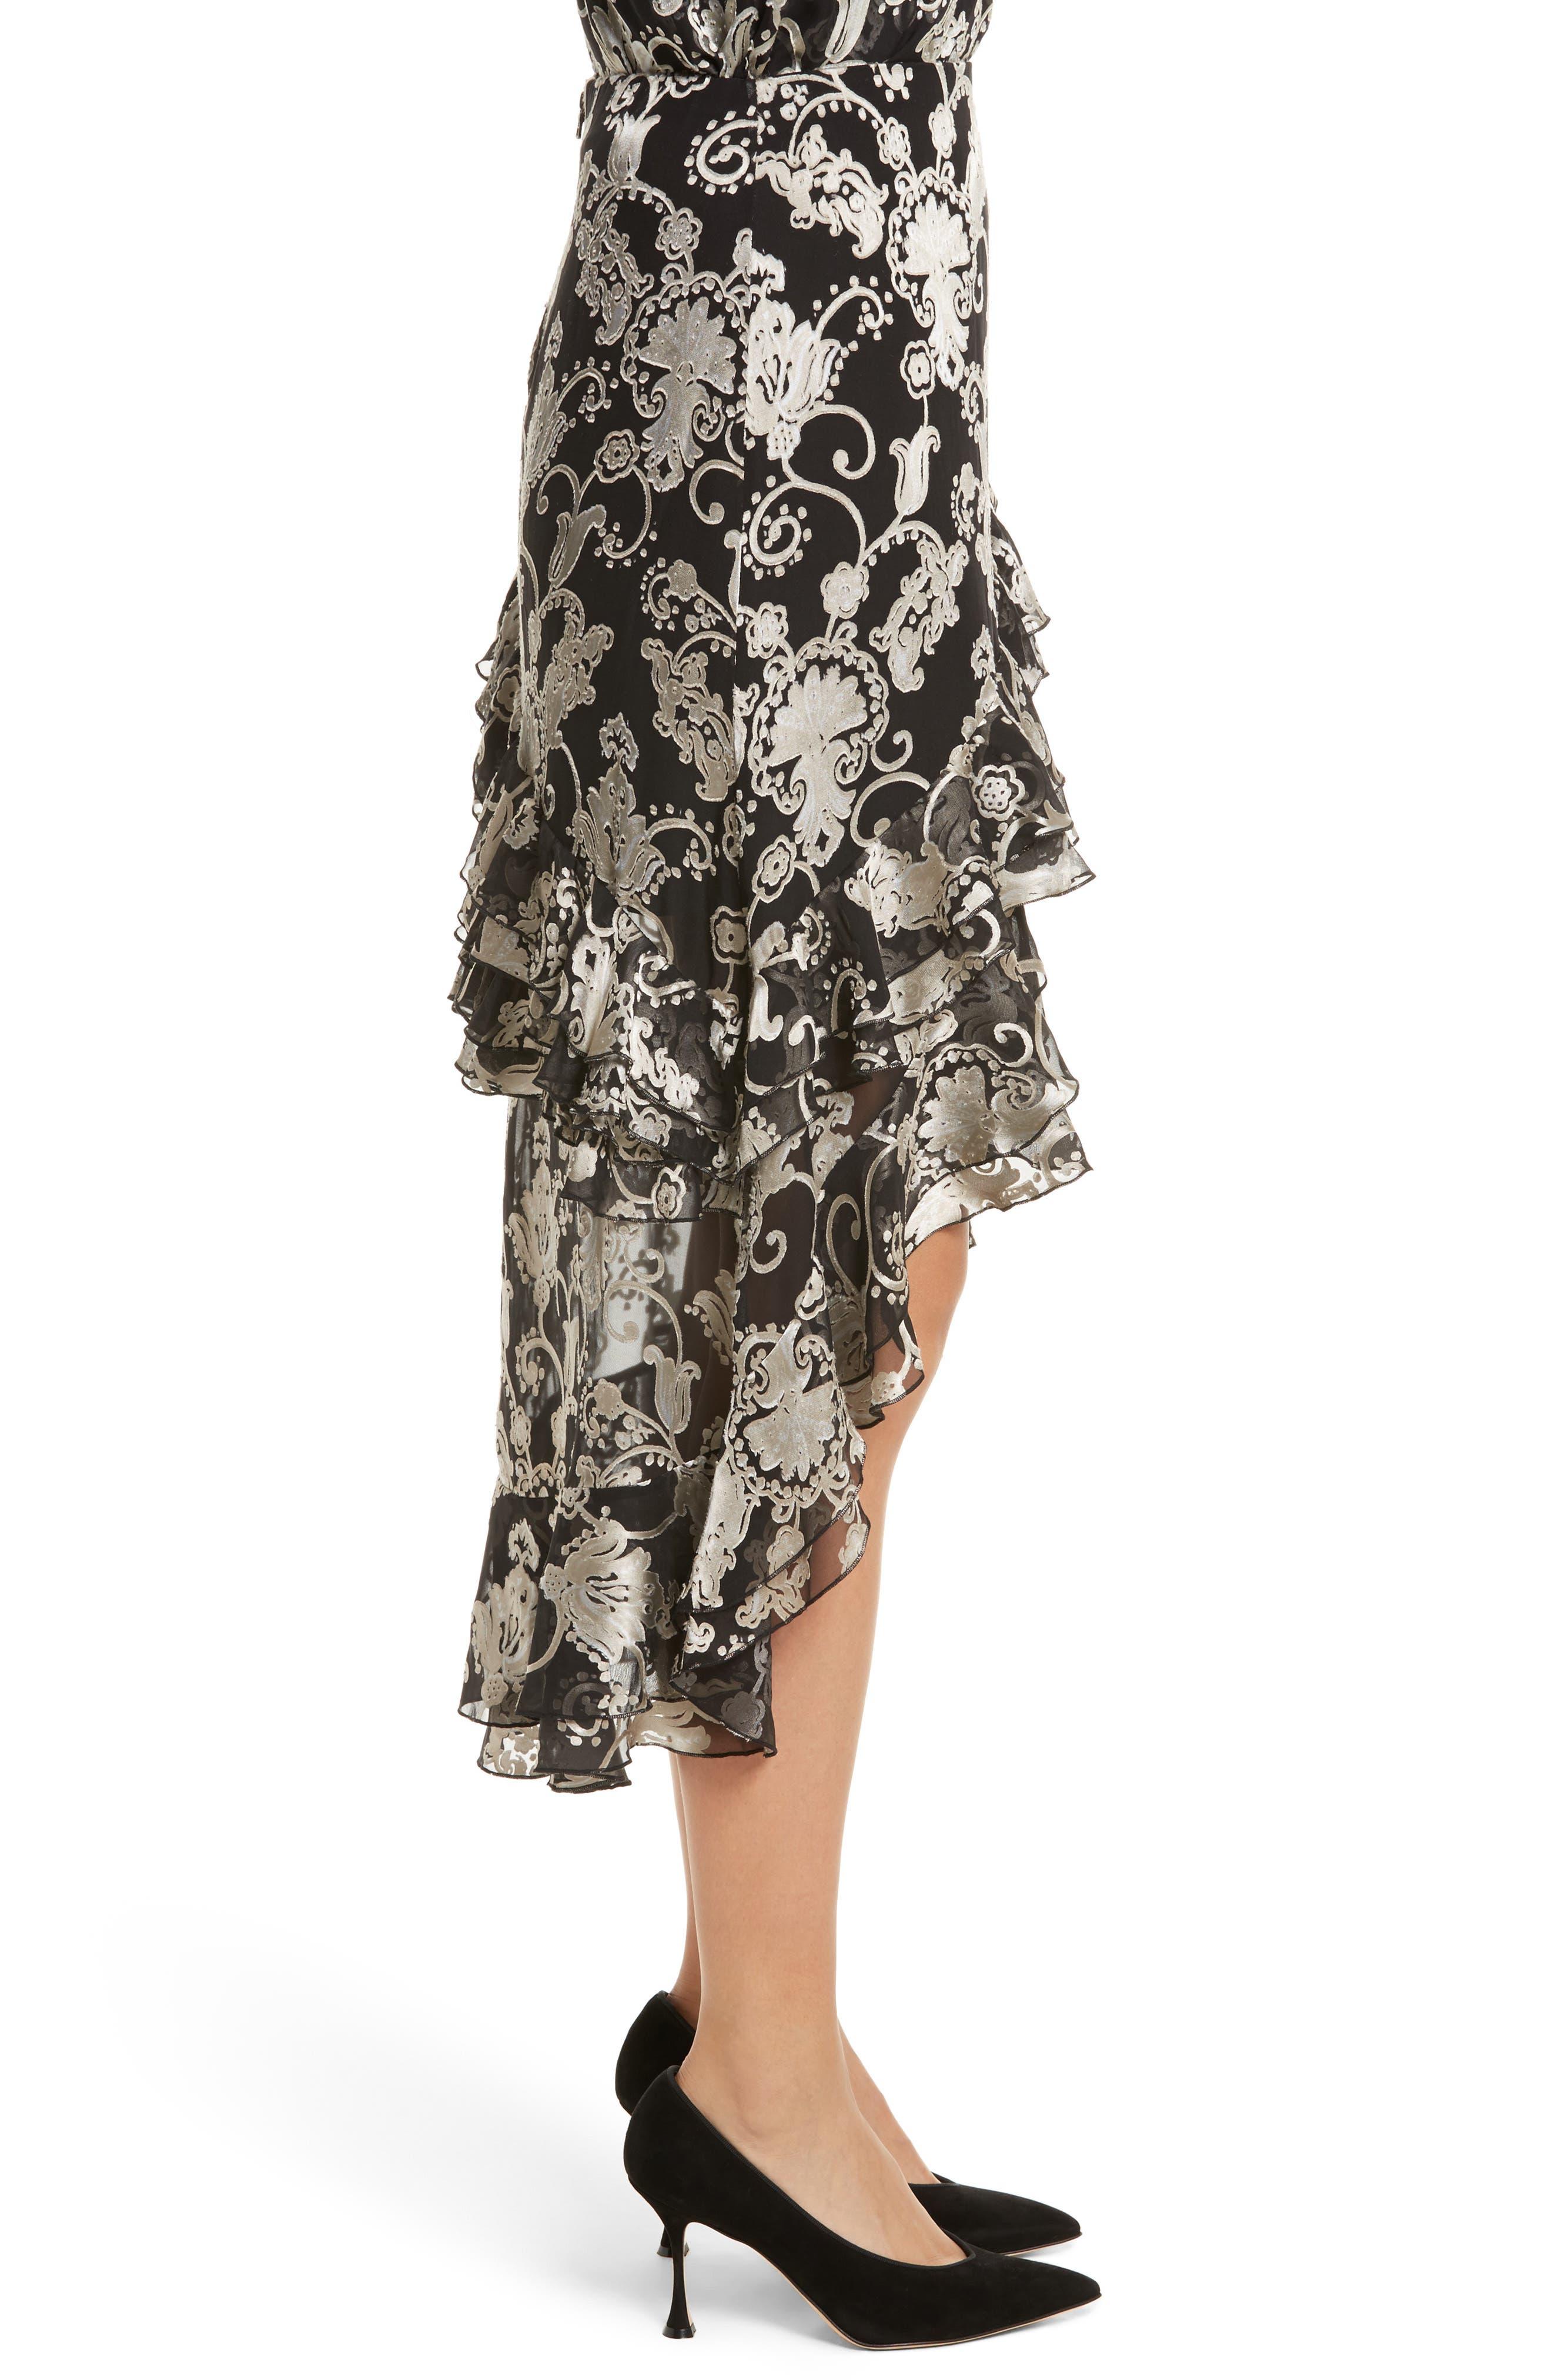 Sasha Asymmetrical Tiered Ruffle Skirt,                             Alternate thumbnail 4, color,                             Black/ White